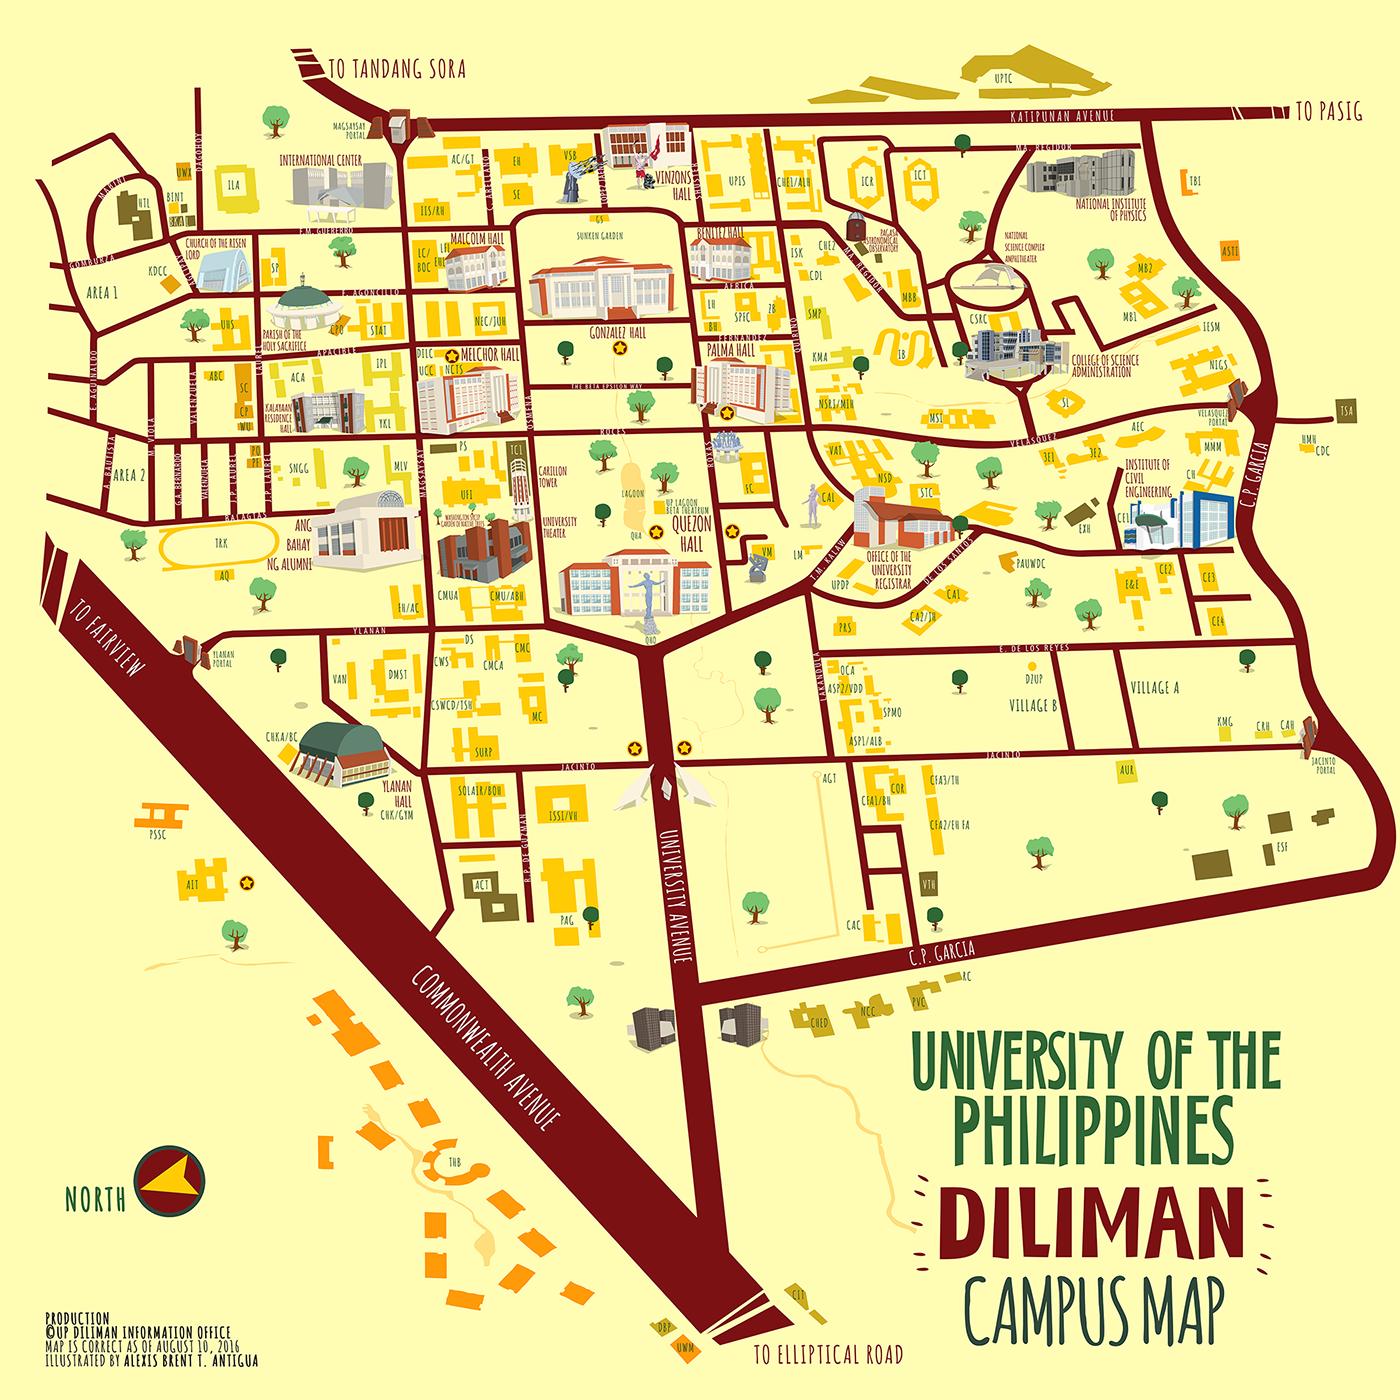 university of cebu main campus map Up Diliman Map From I 1 Campusmap Updiliman Philippine university of cebu main campus map